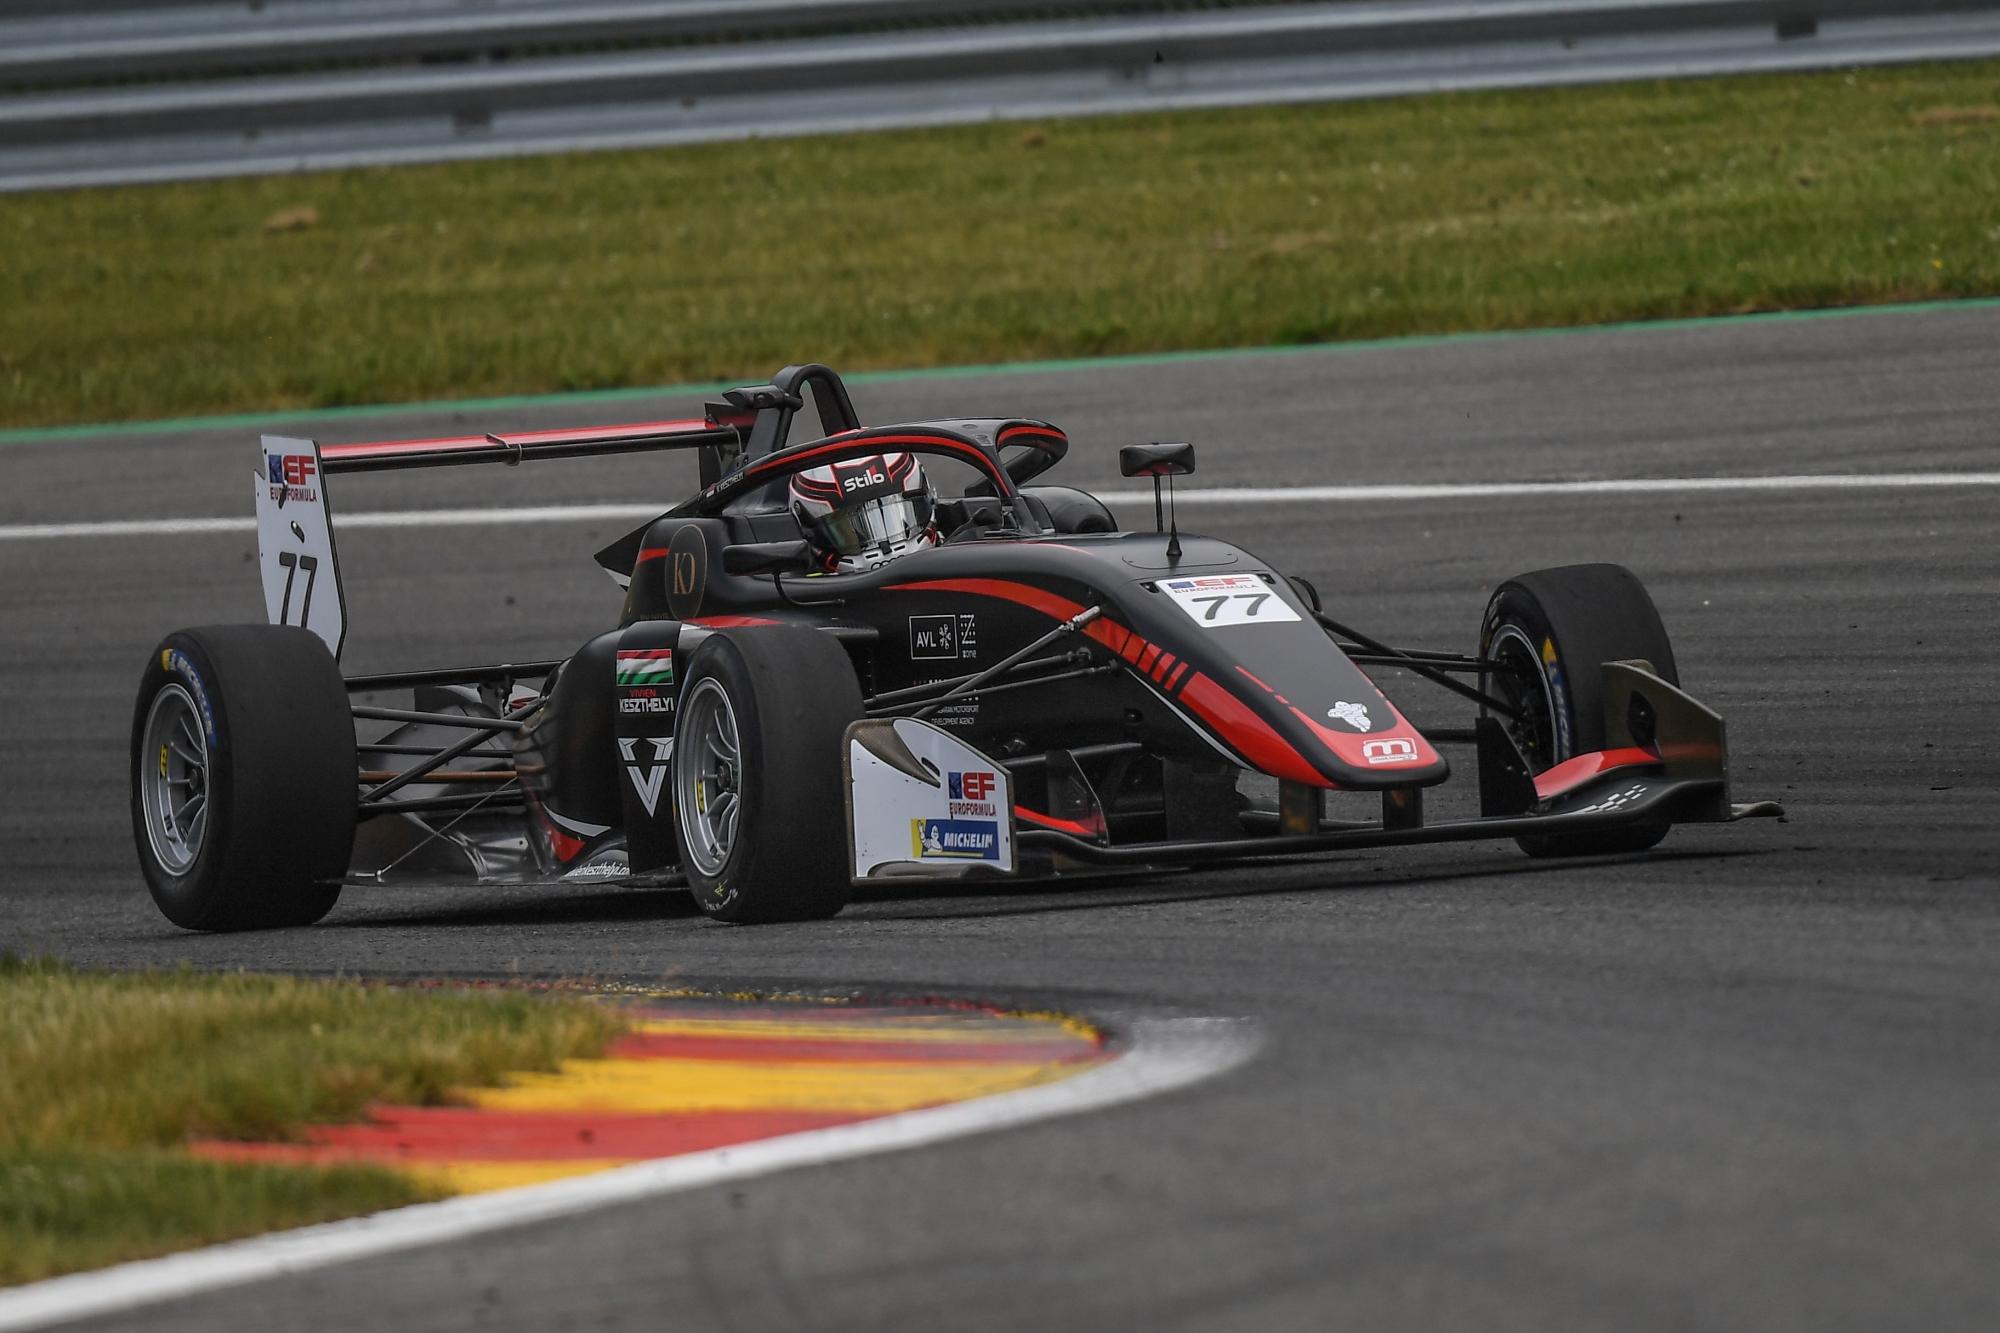 vivien-keszthelyi_f3-euroformula-open_formula-3_belgium_spa_hungarian-racing-driver_4.JPG